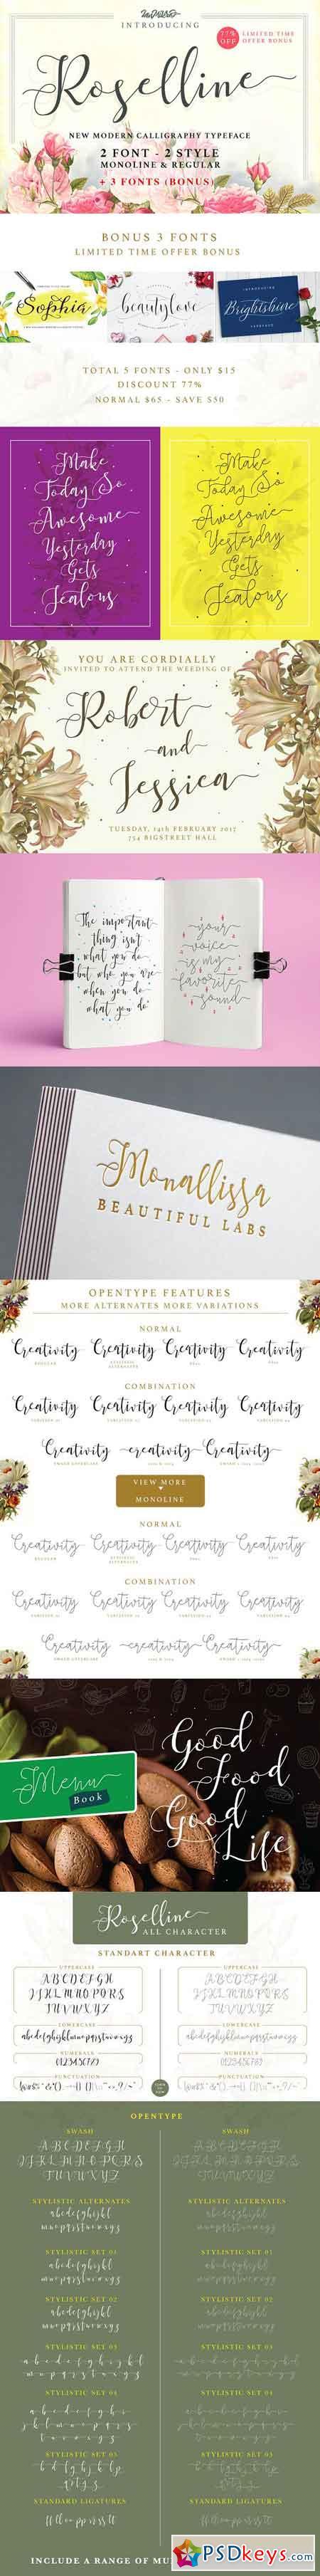 Roselline Typeface - 2 Style + BONUS